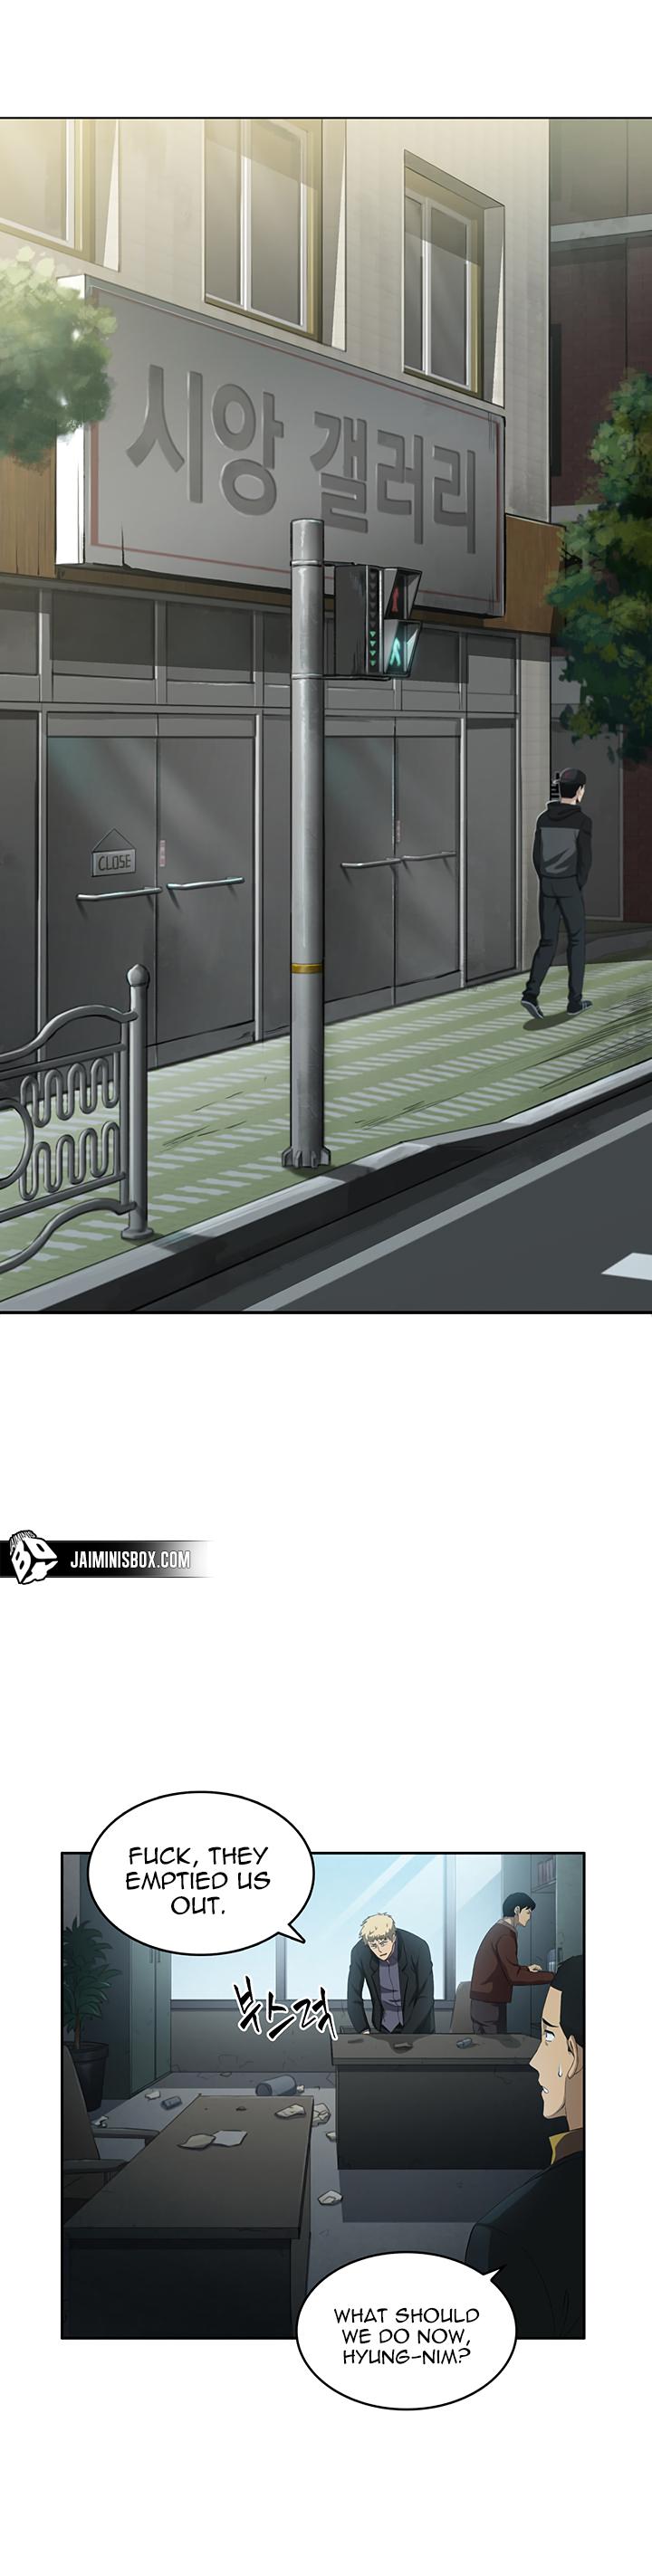 https://img2.nineanime.com/comics/pic2/22/29142/774786/9d8b2eec1345999e43fd482bdb9786ab.jpg Page 1